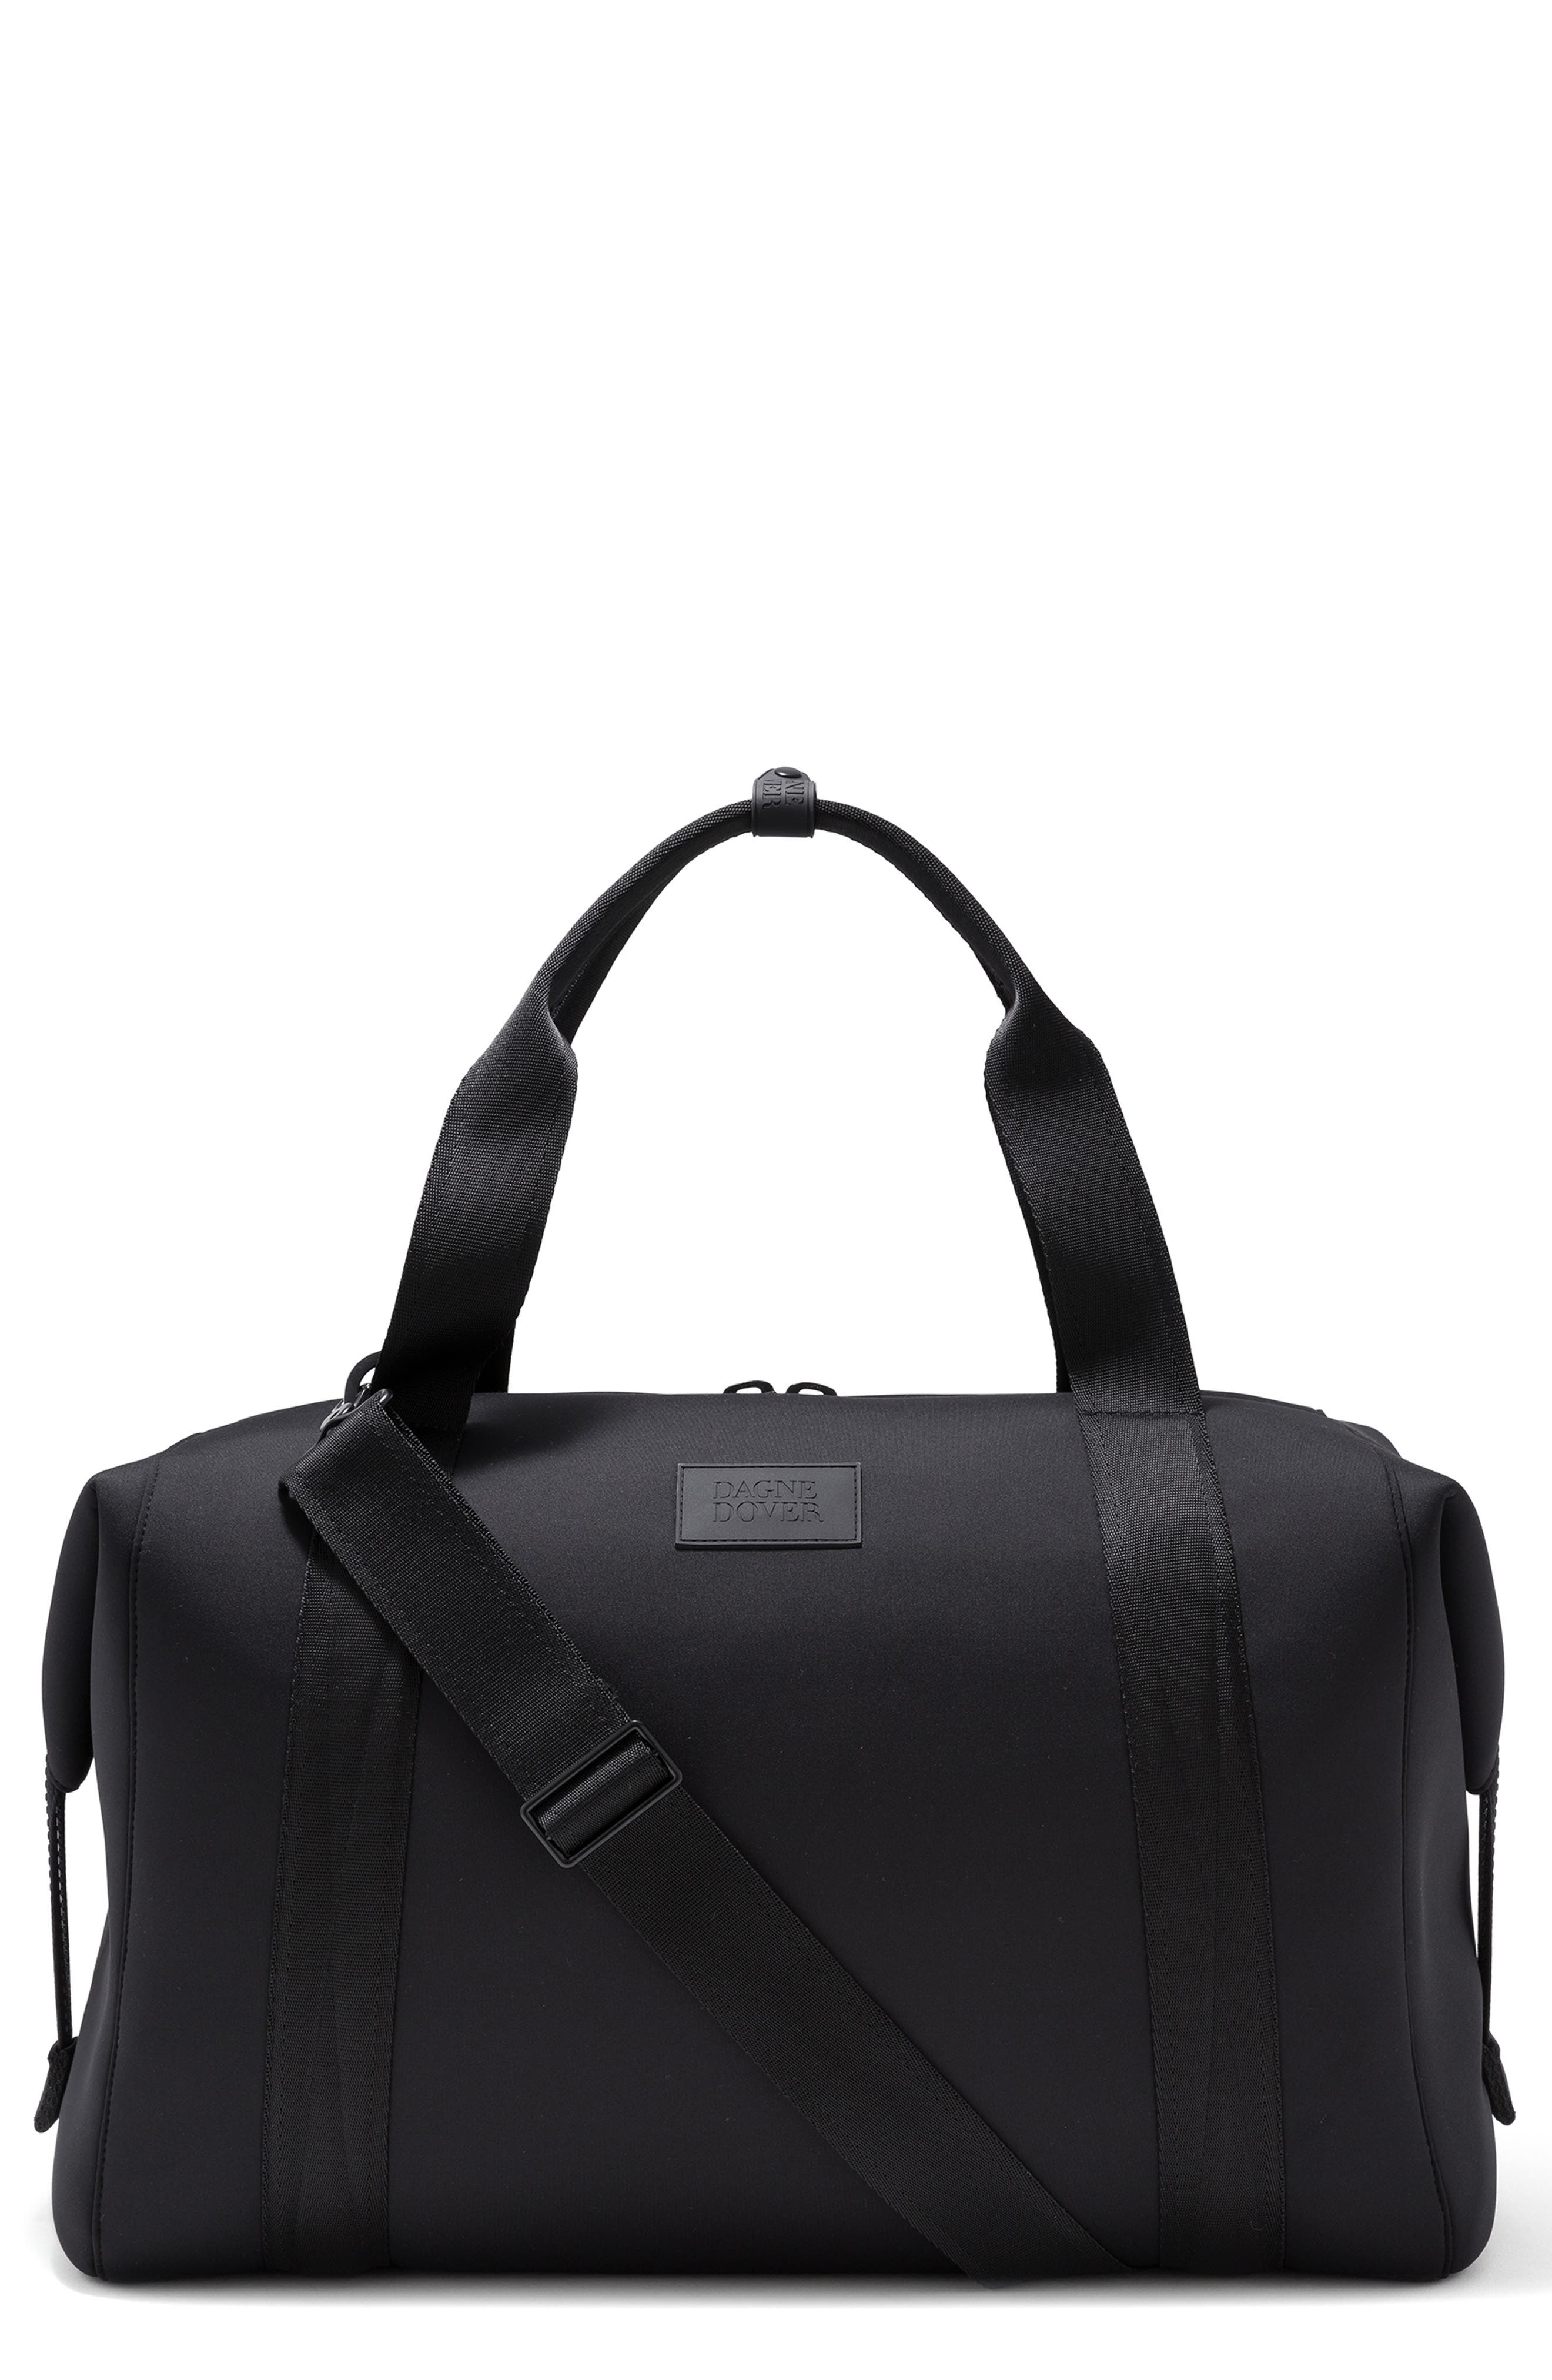 DAGNE DOVER Xl Landon Carryall Duffel Bag - Black in Onyx